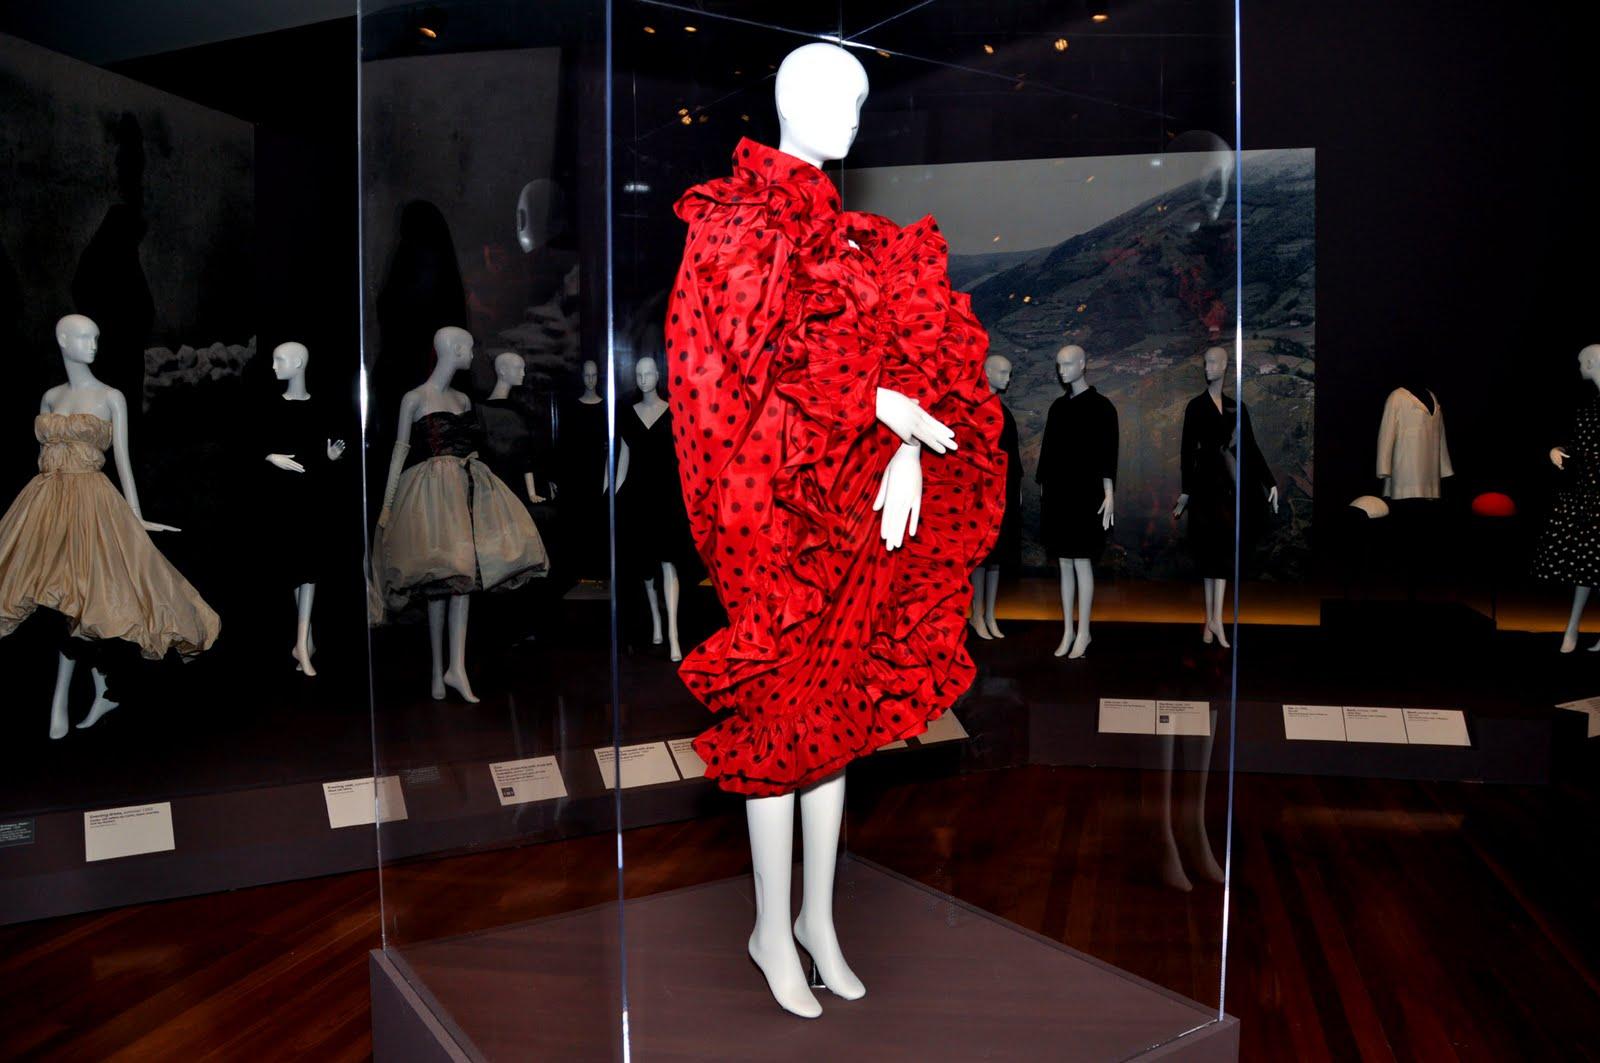 2011-04-21-3.reddress.jpg